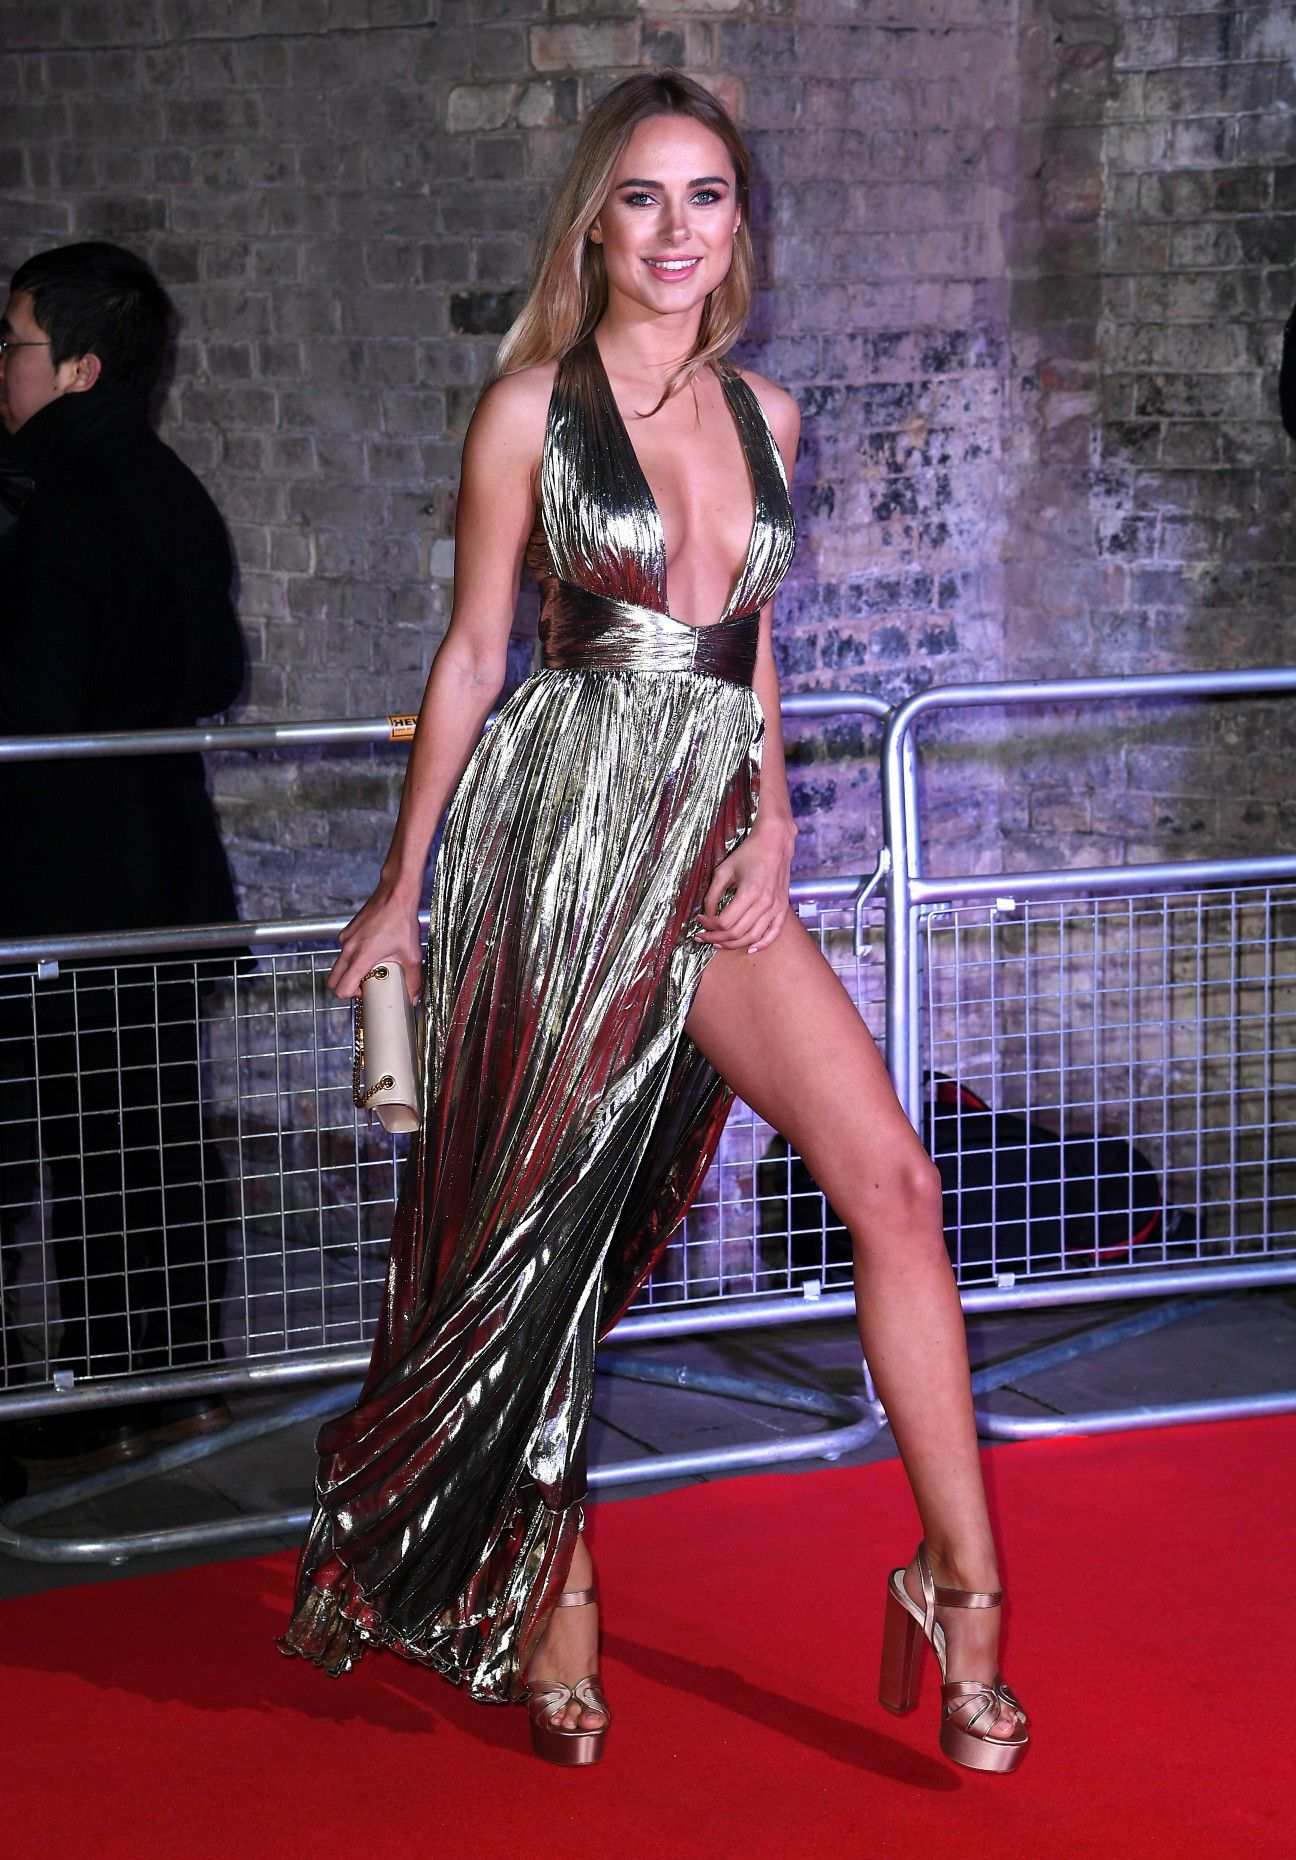 kimberley-garner-cleavage-at-fabulous-fund-fair-in-london-3064